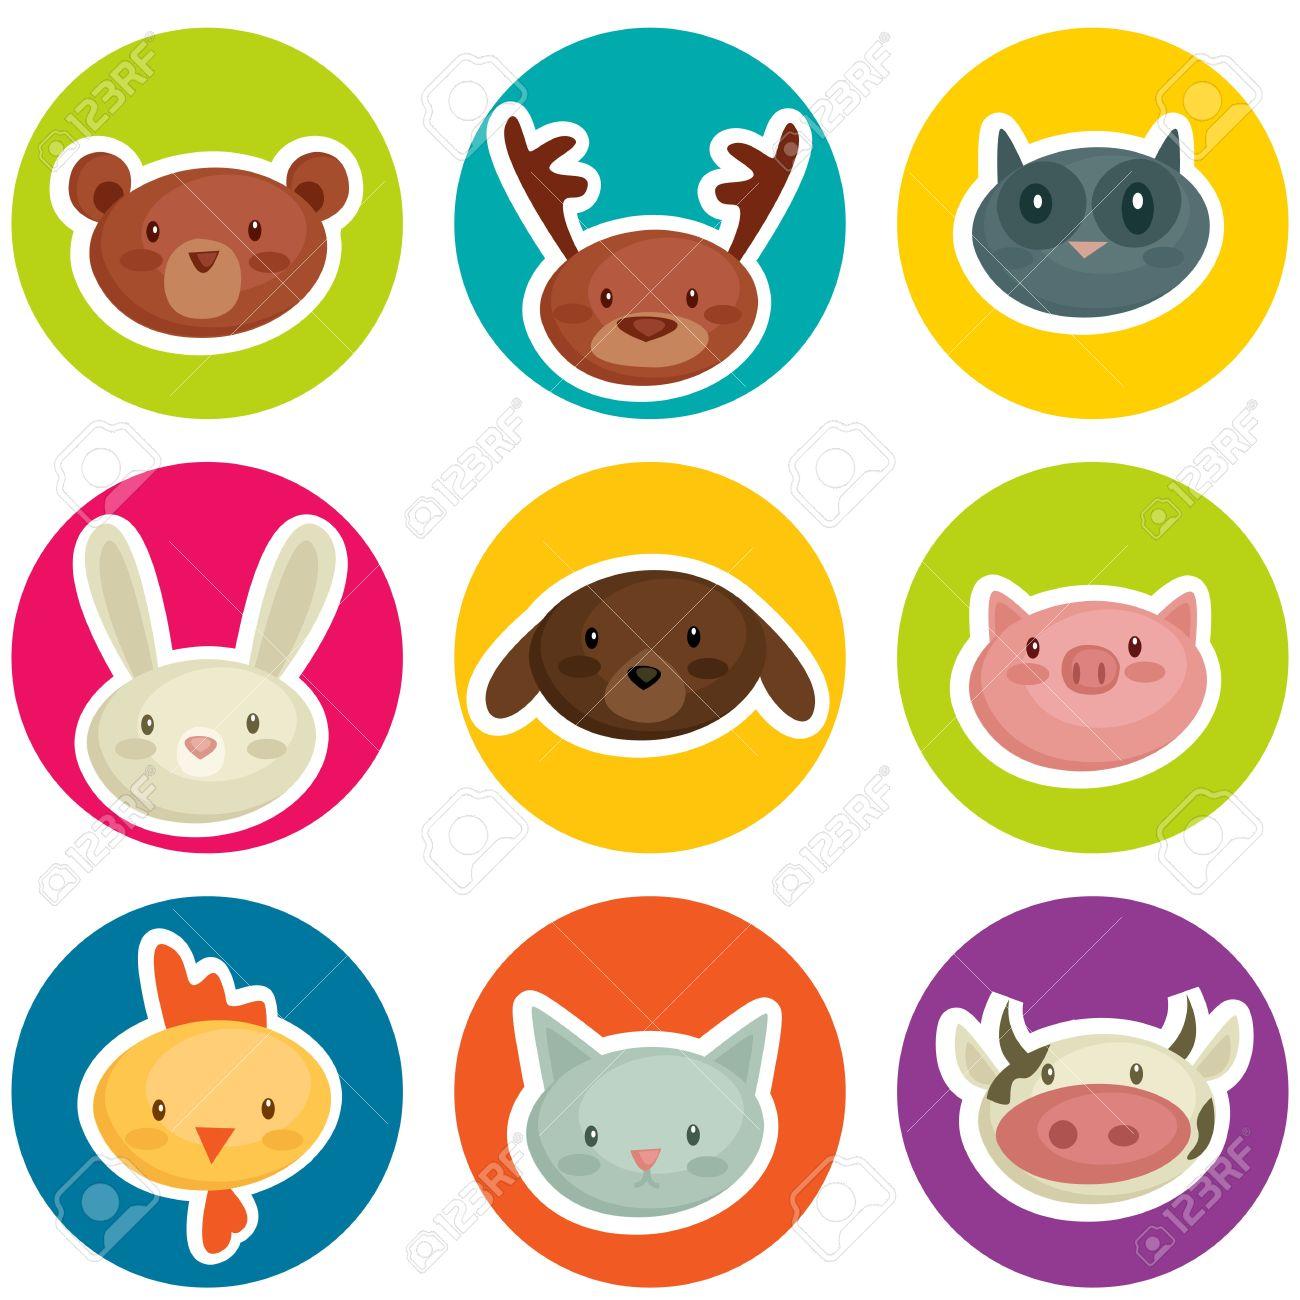 cartoon animal head stickers, vector illustration Stock Vector - 10282589